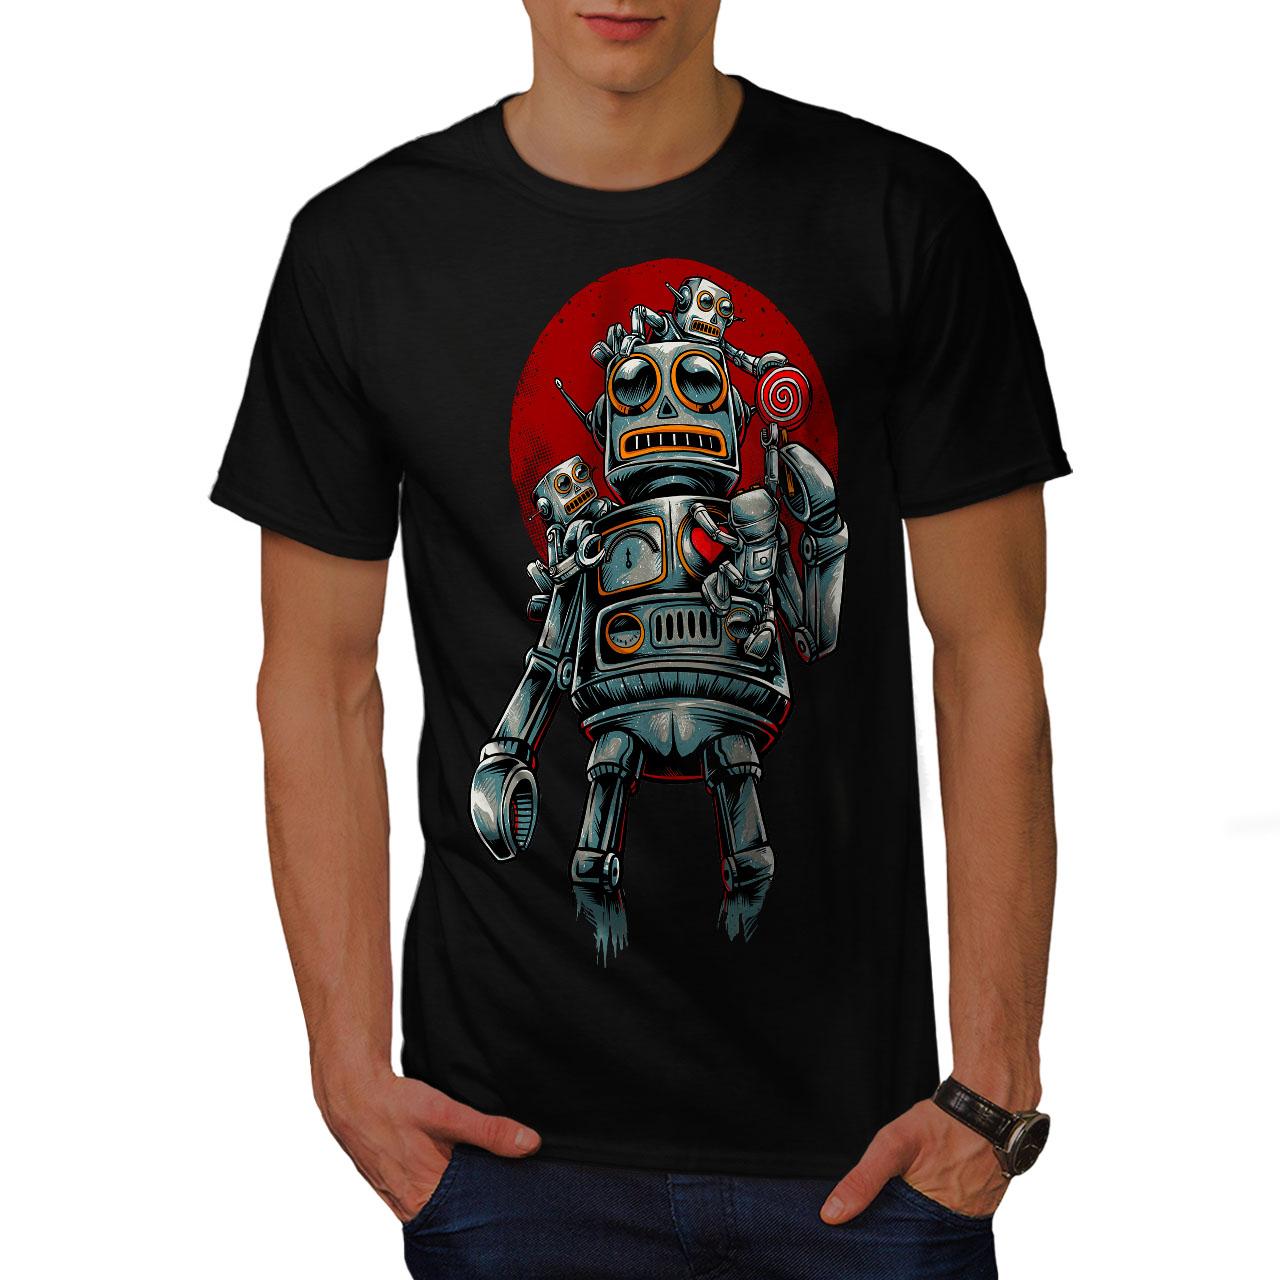 miniature 3 - Wellcoda Crazy Robot Mens T-shirt, Mechanical Graphic Design Printed Tee